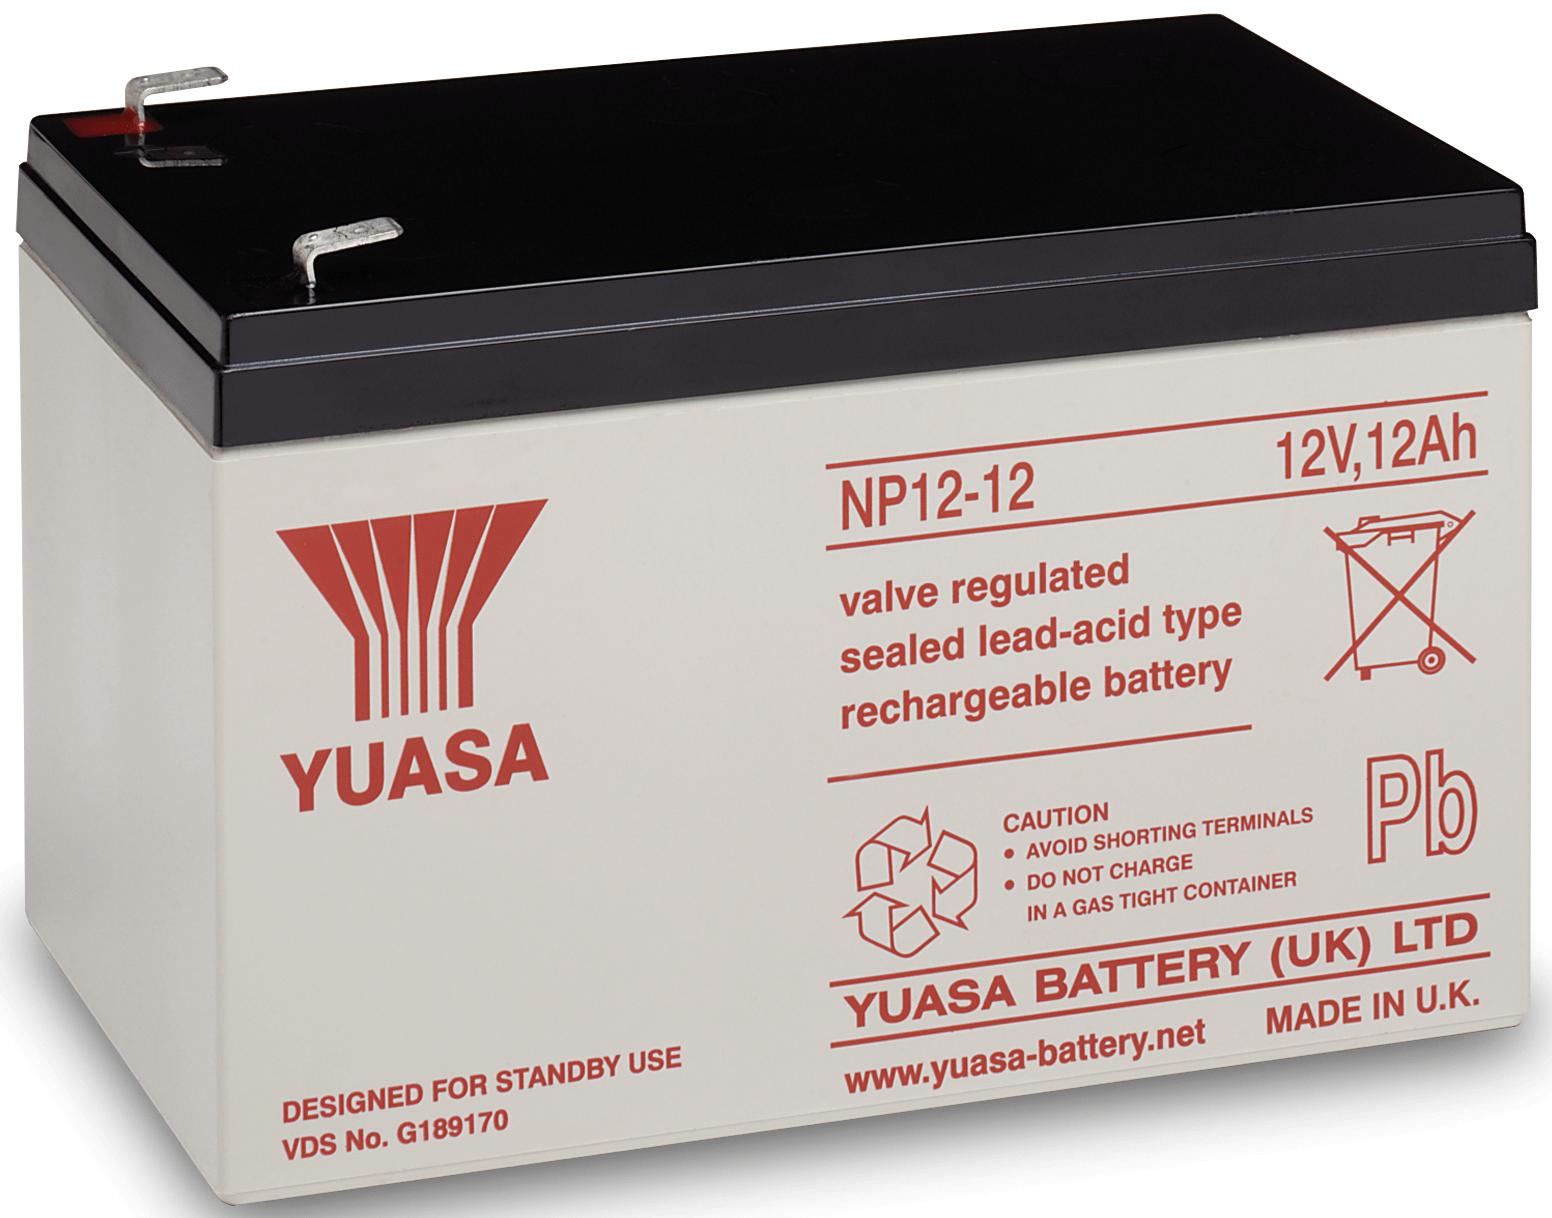 Yuasa NP12-12 Loodaccu 12 V 12 Ah Loodvlies (AGM) Kabelschoen 6.35 mm (b x h x d) 151 x 98 x 98 mm